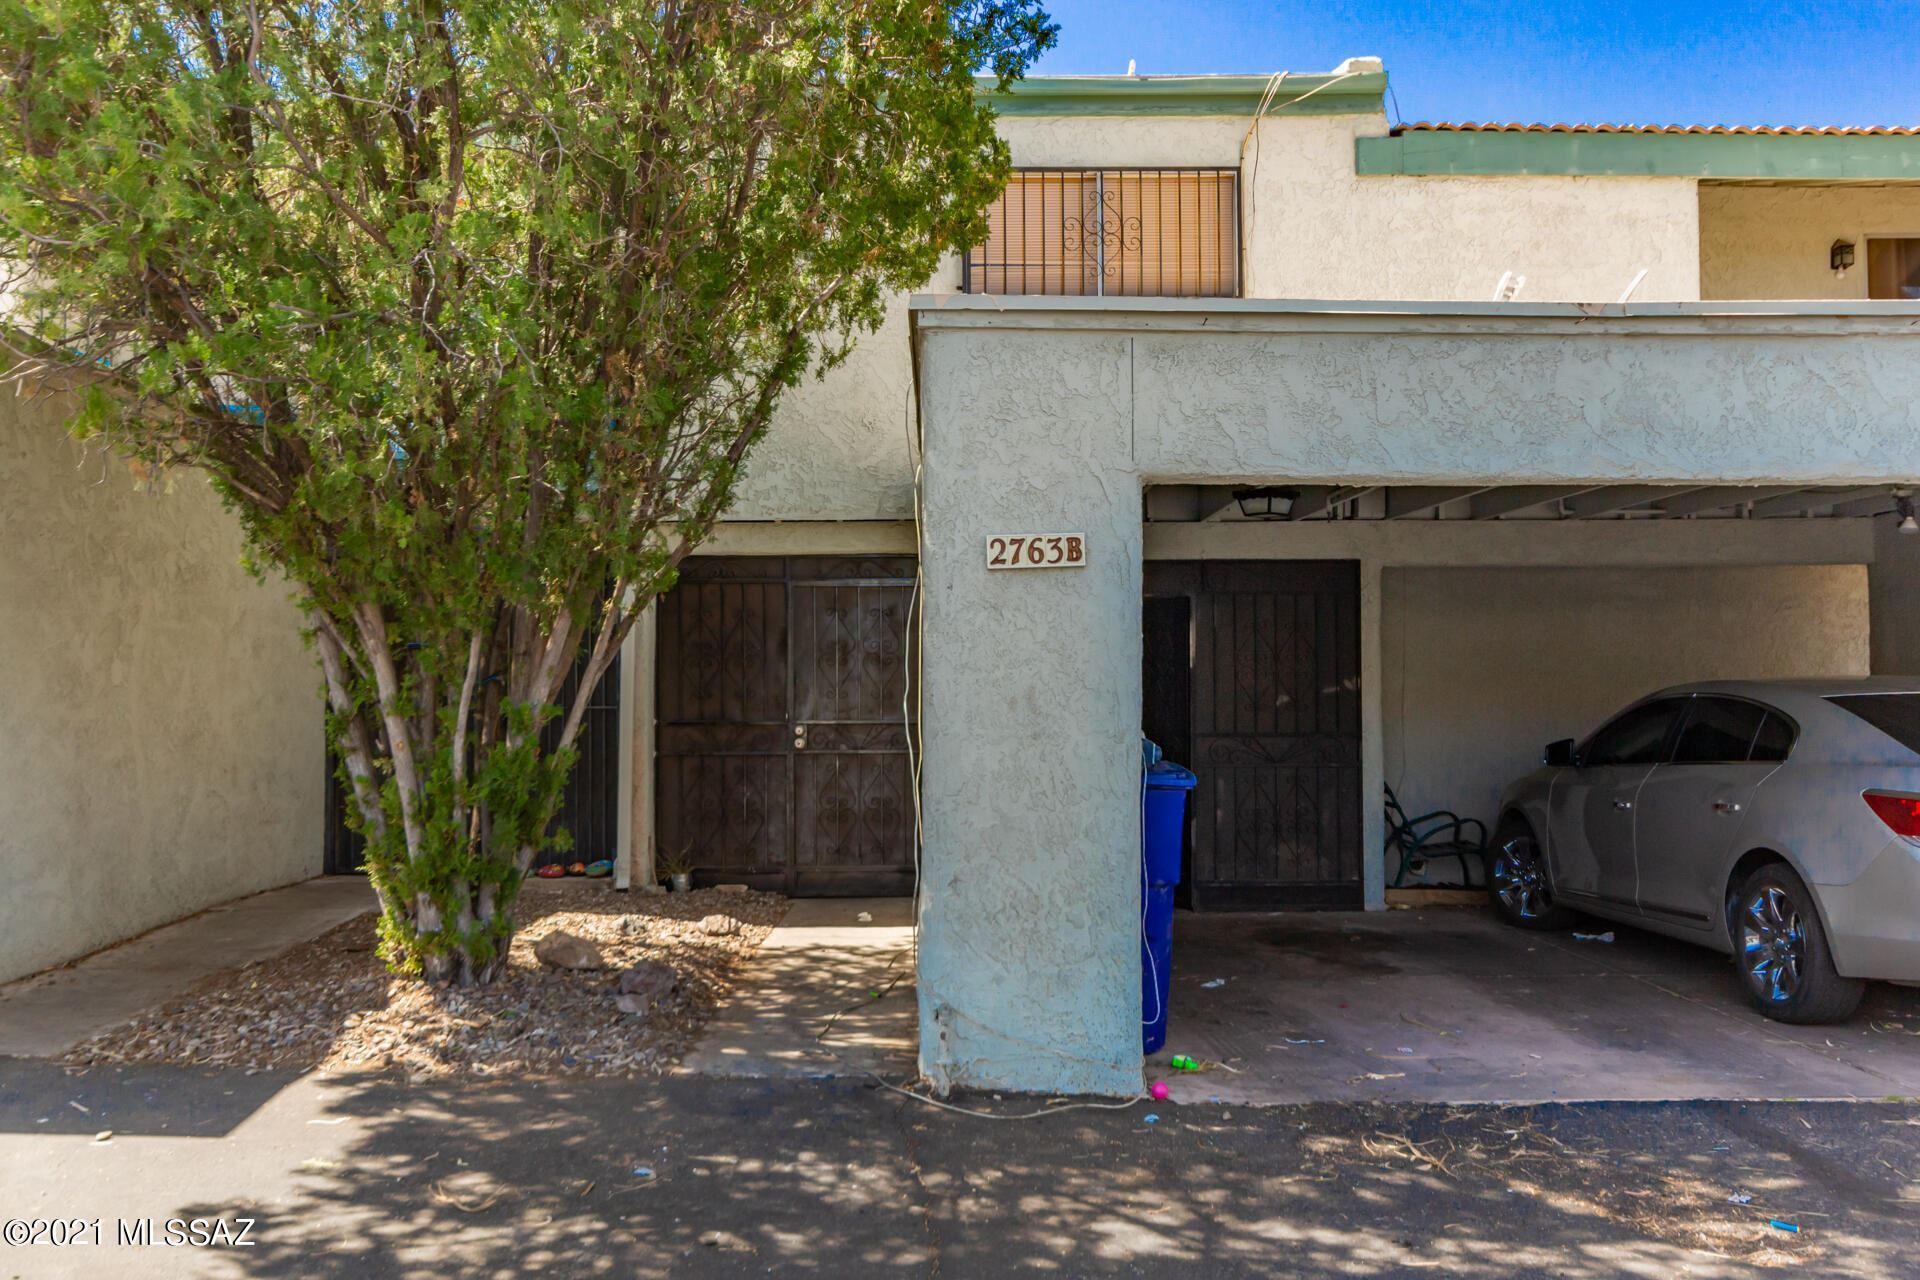 2763 W Anklam Road #B, Tucson, AZ 85745 - MLS#: 22107515